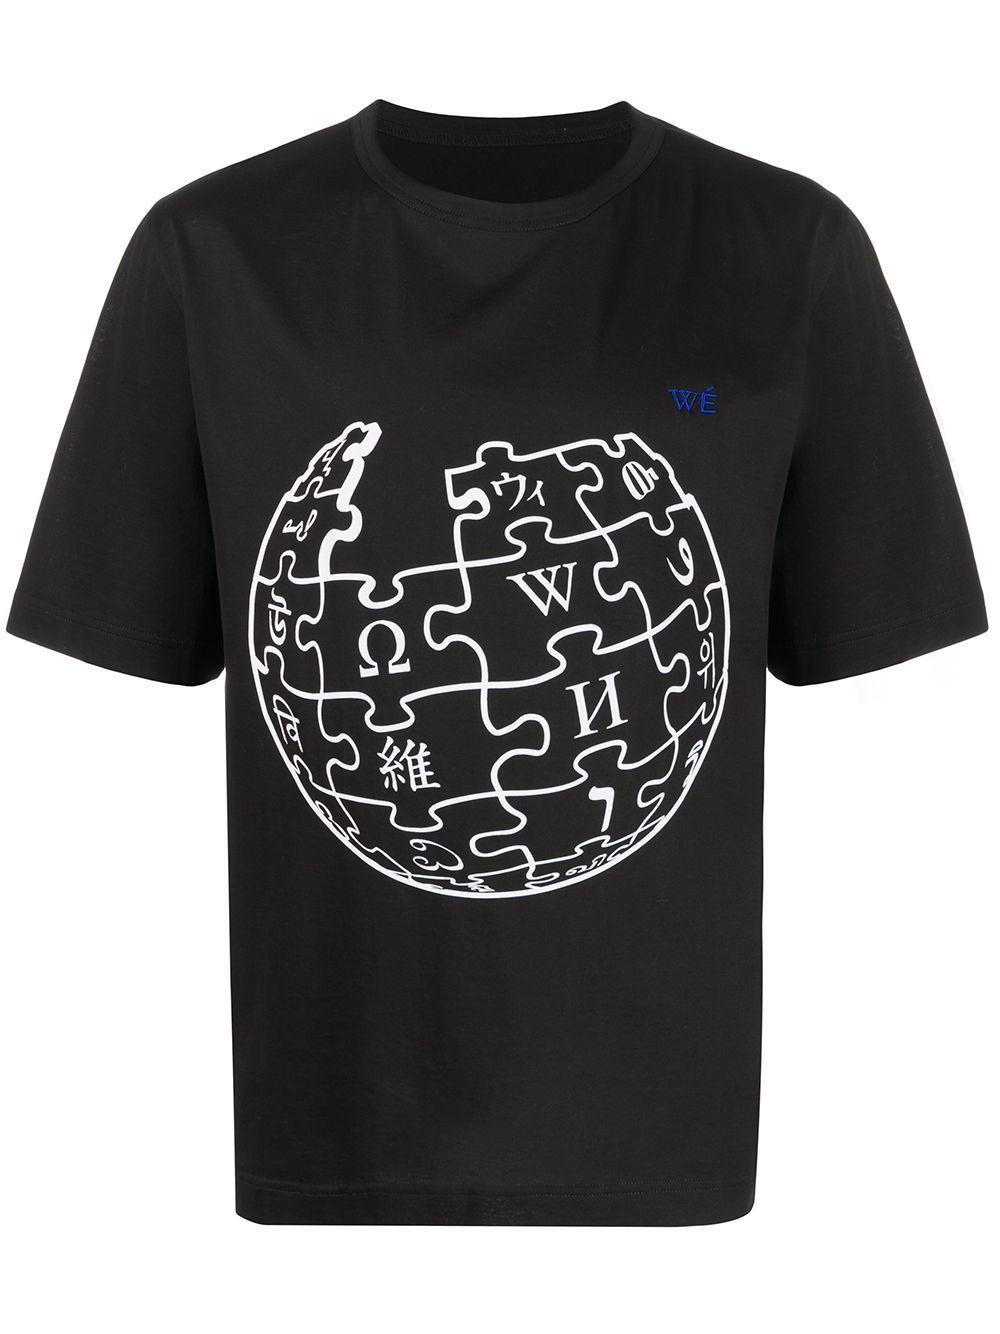 Etudes Unity Sphere Wikipedia Graphic Print T Shirt Farfetch In 2020 T Shirt Print T Shirt Shirts